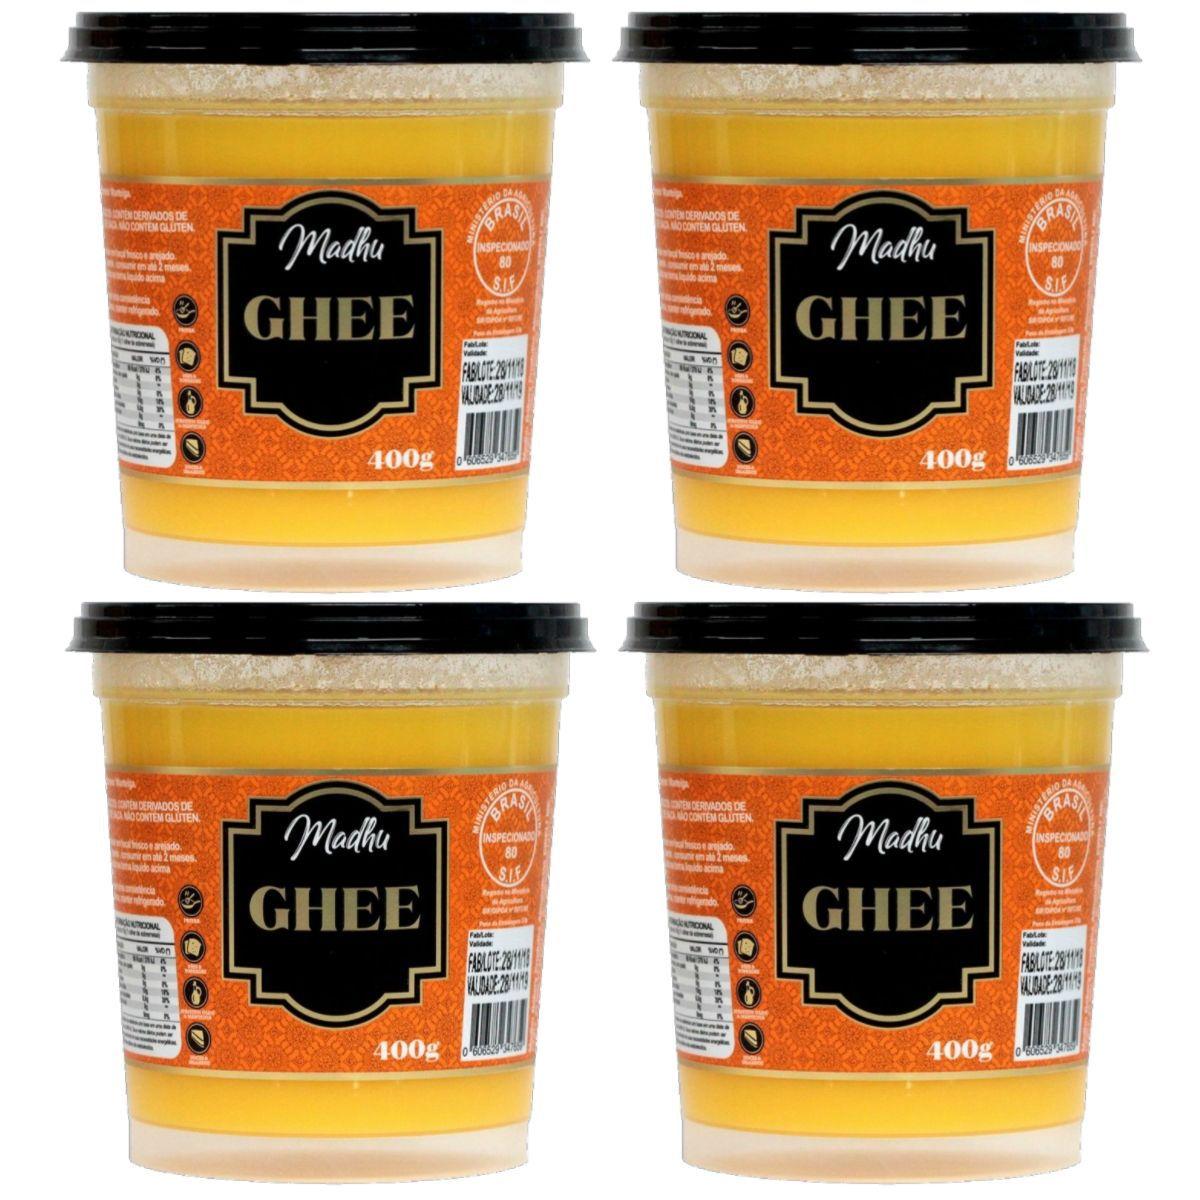 Kit 4 Manteigas Ghee 400g Tradicional Clarificada Zero Lactose - Madhu